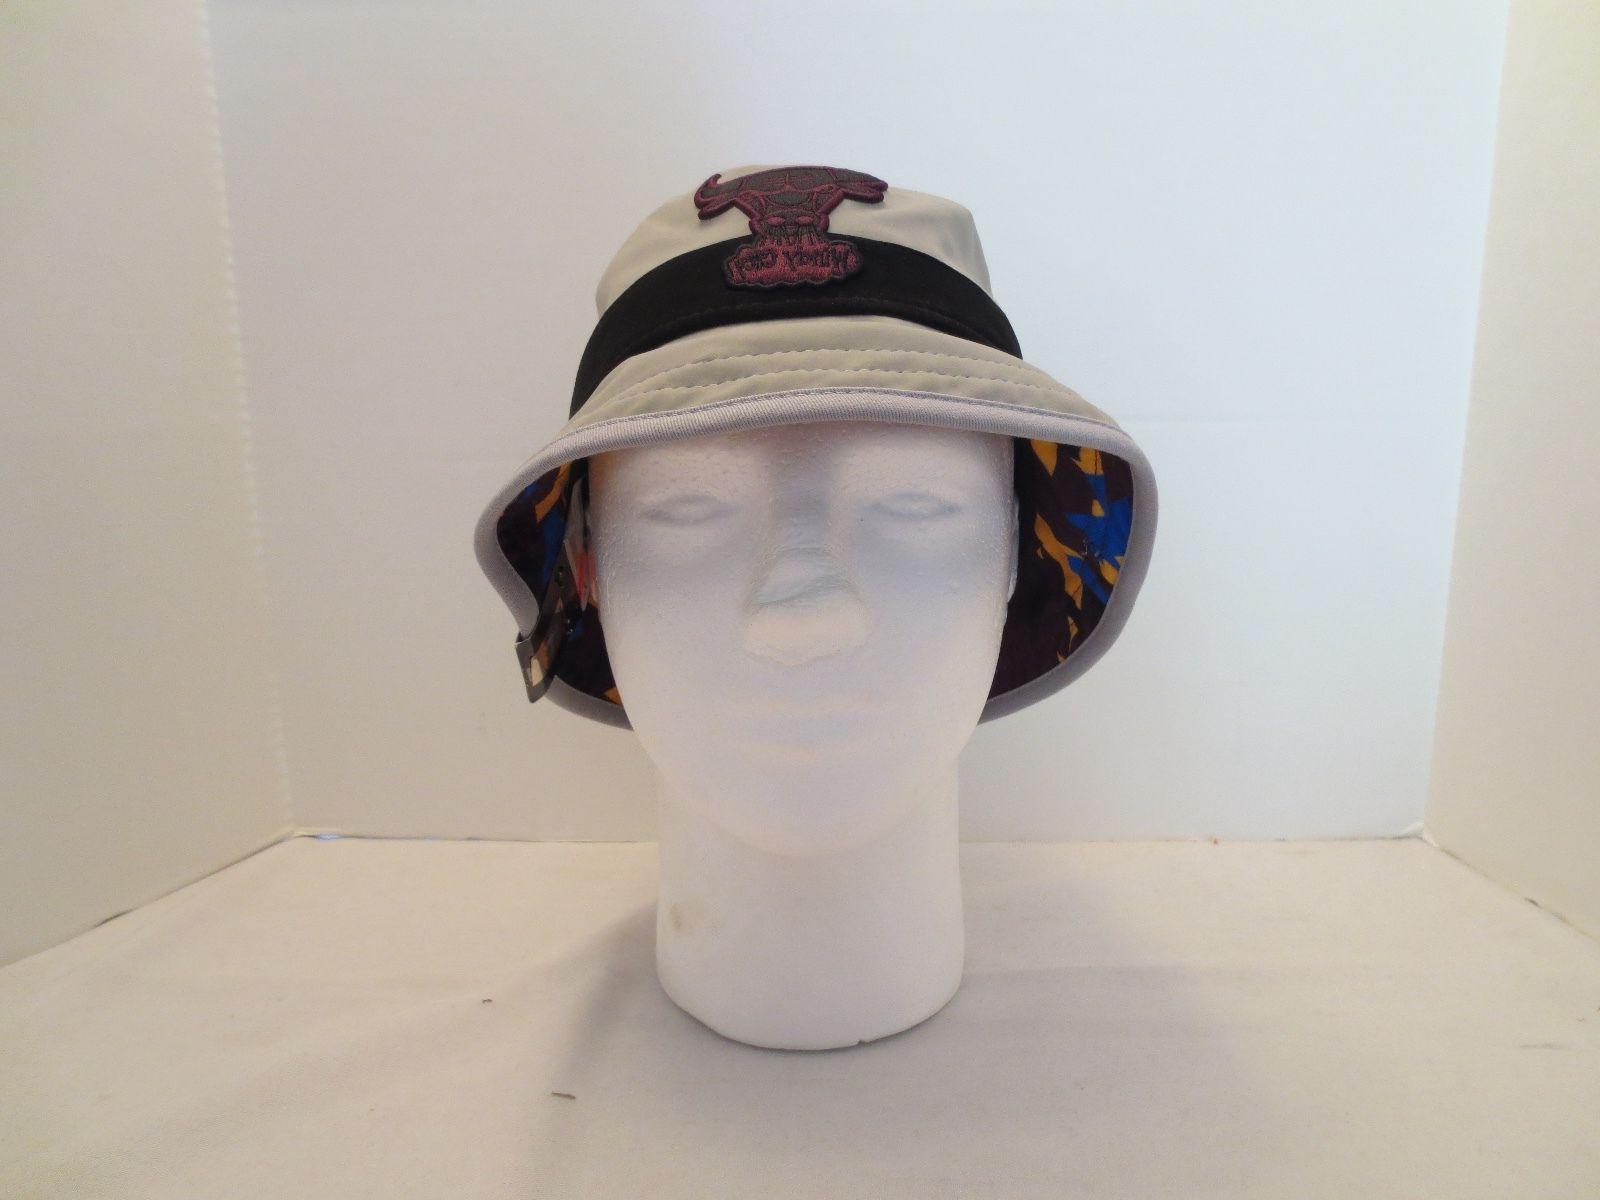 retro 7 vii bordeau bucket hat cap